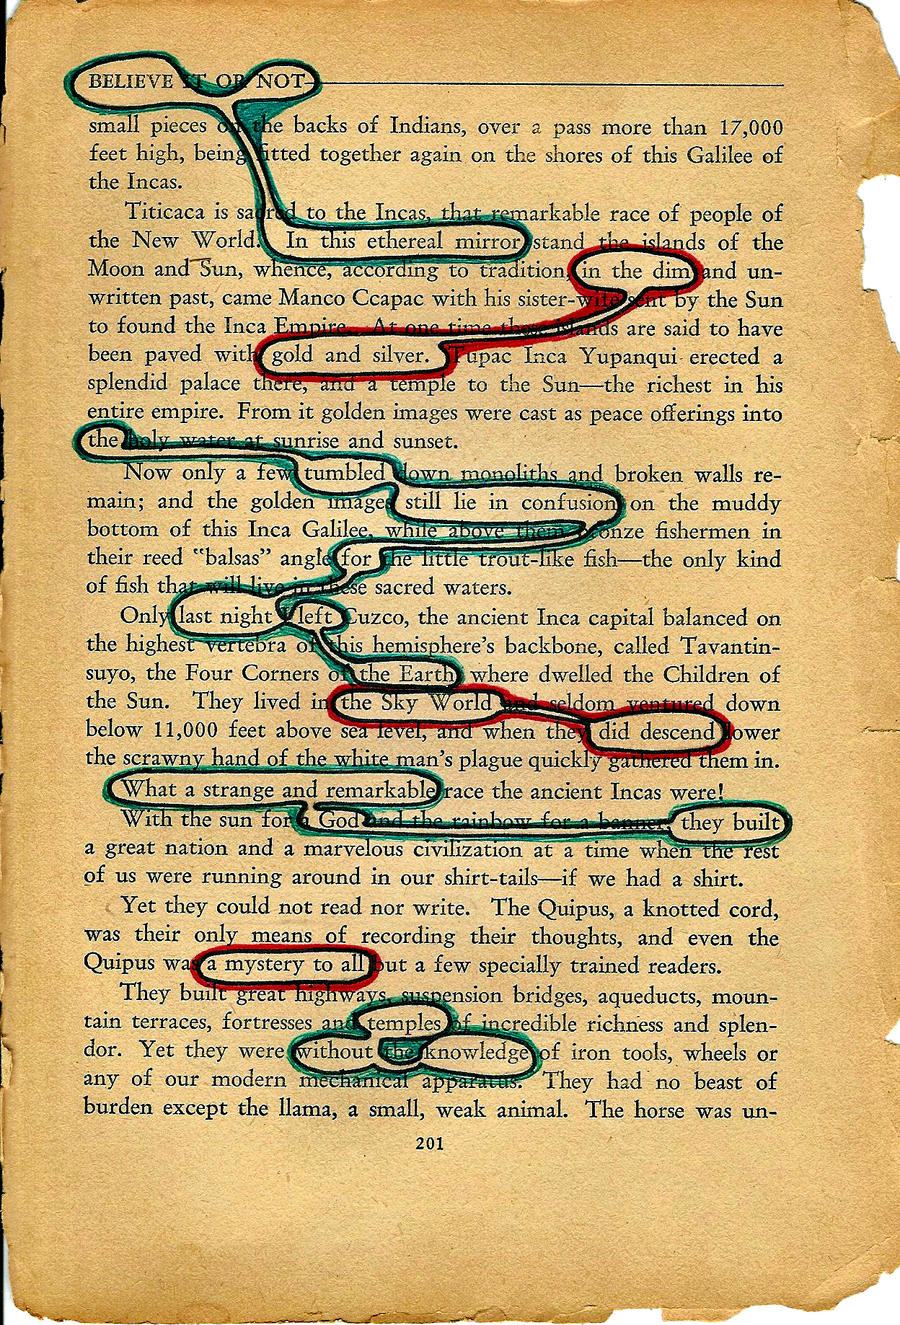 Believe Not-Found Poetry by danidrastic